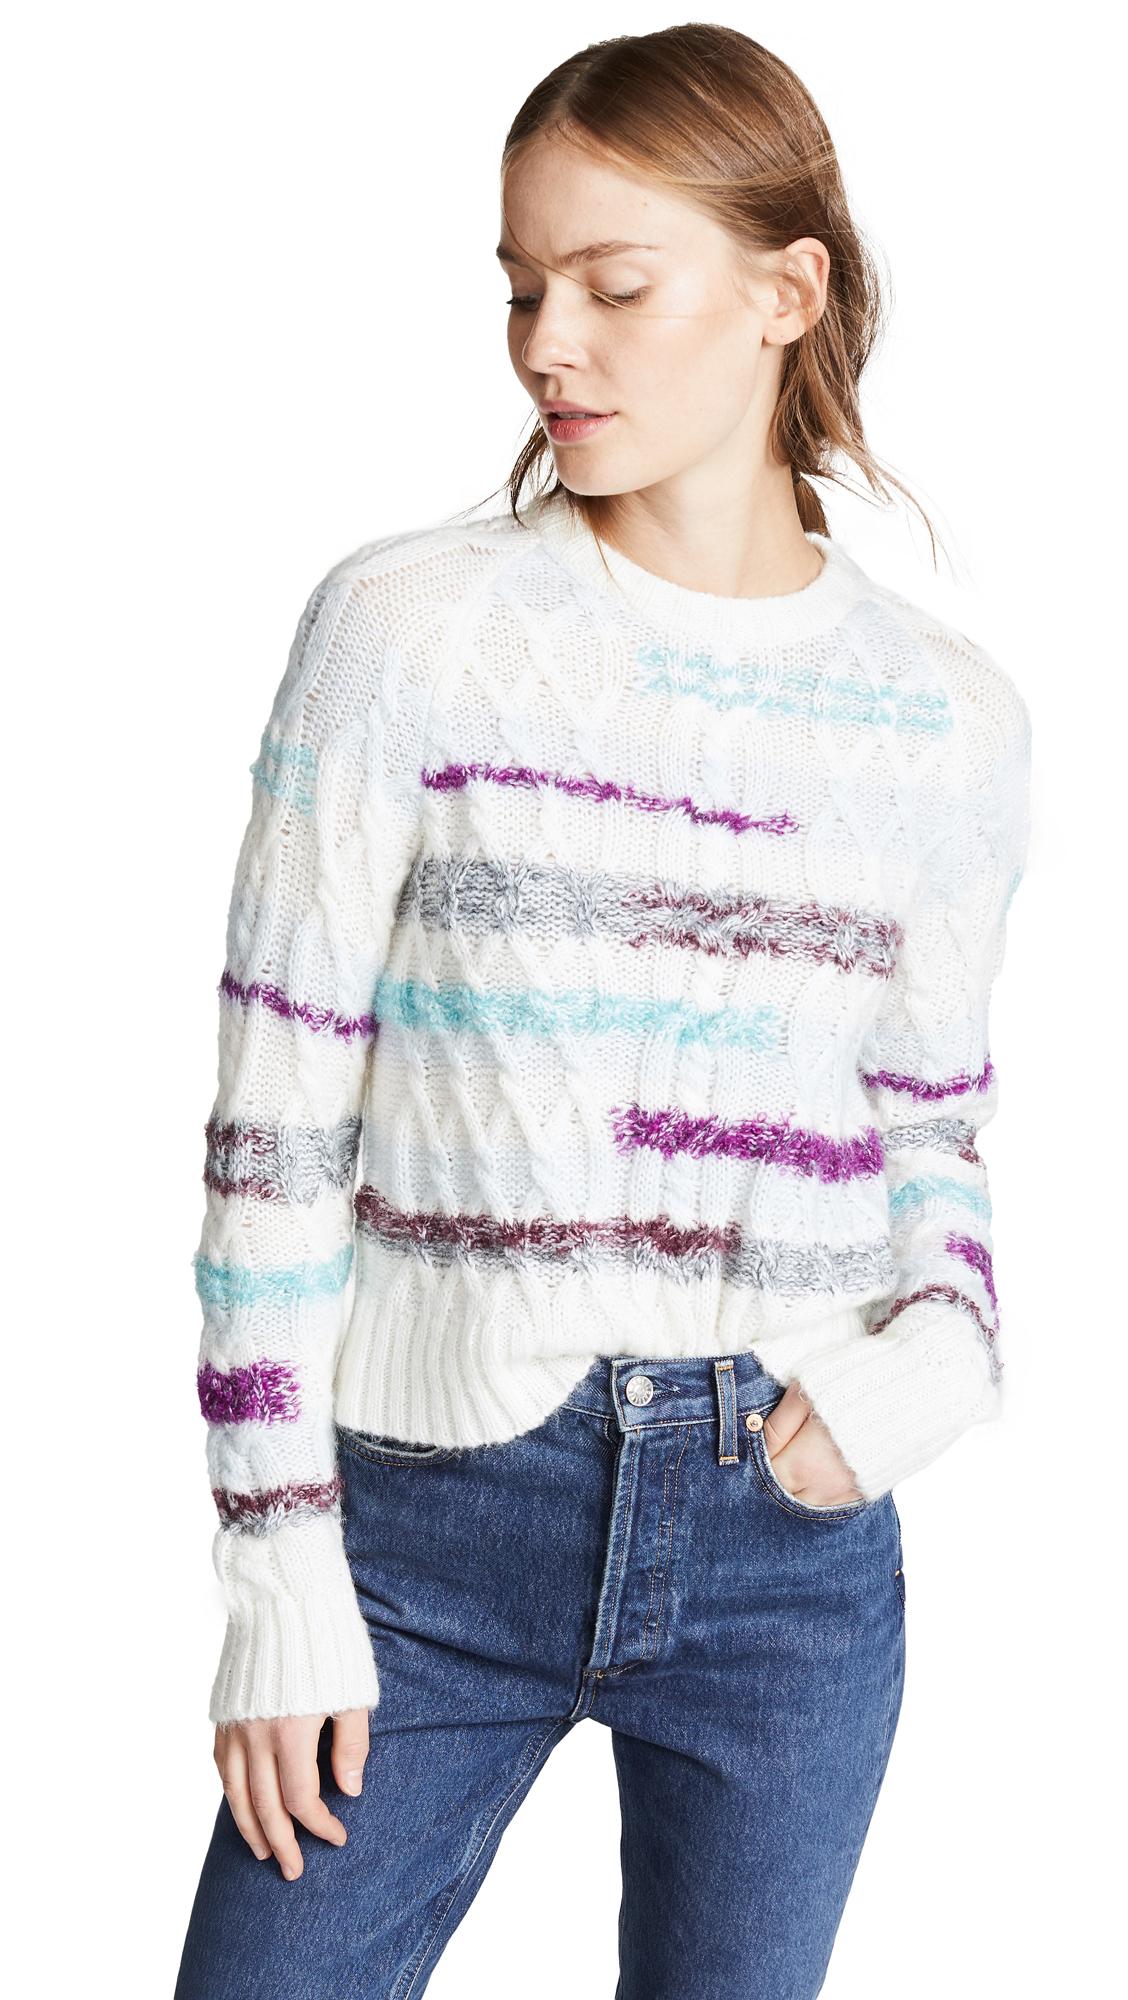 TANYA TAYLOR Lora Stripe Cable Knit Sweater in Cream Multi